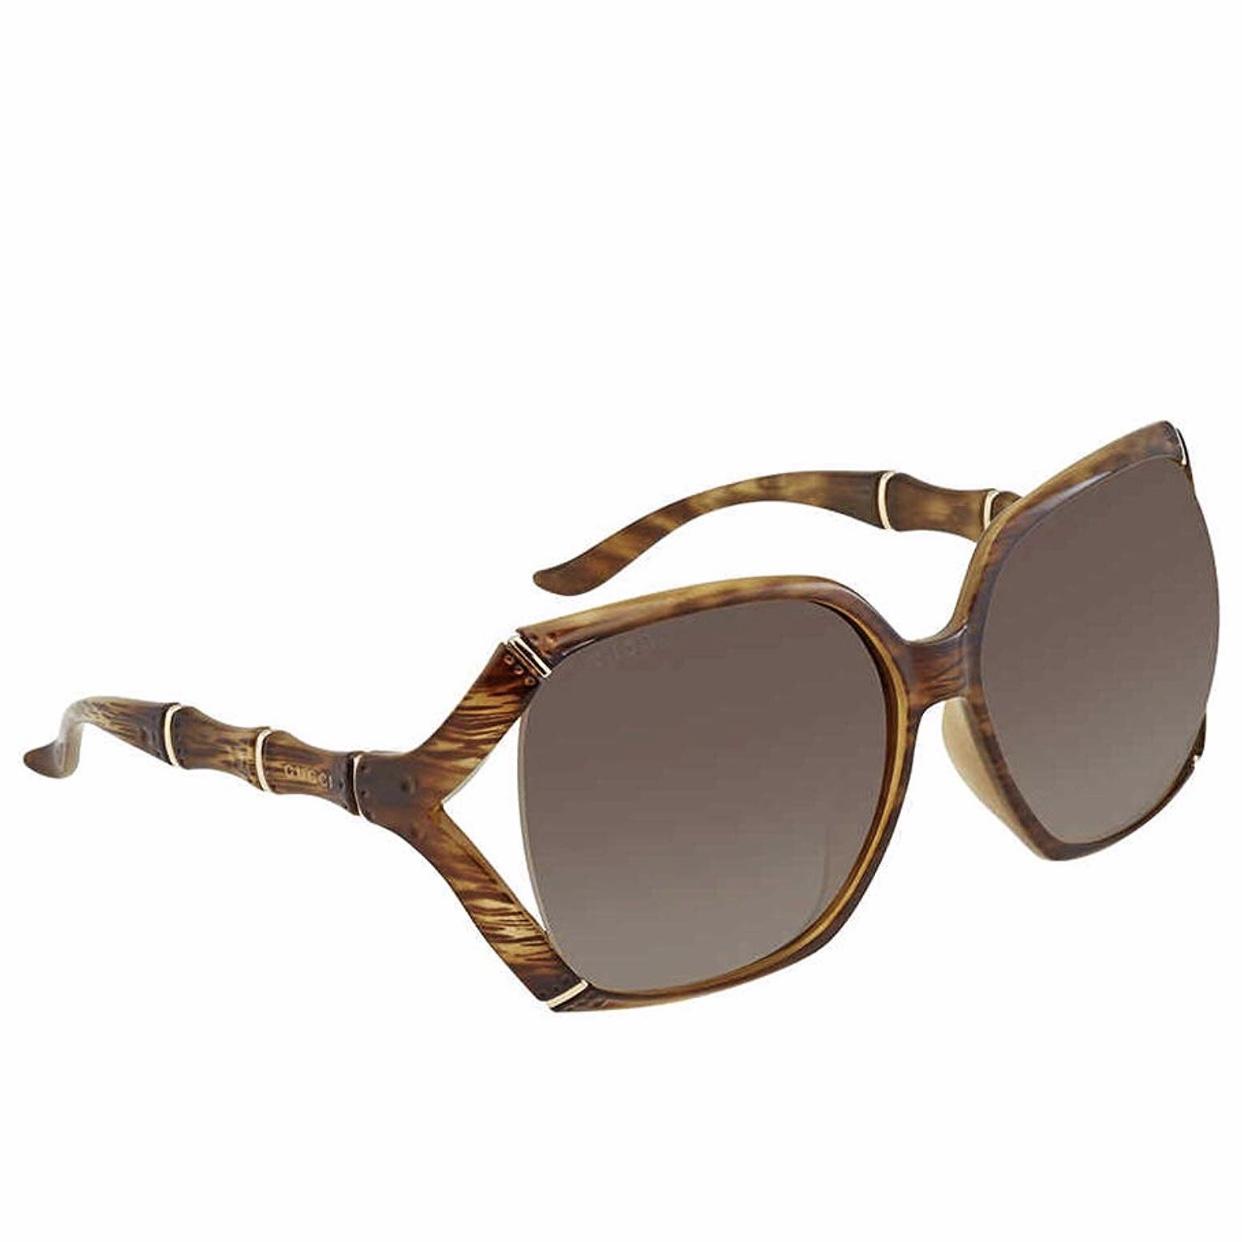 Gucci Women's Oversized Sunglasses